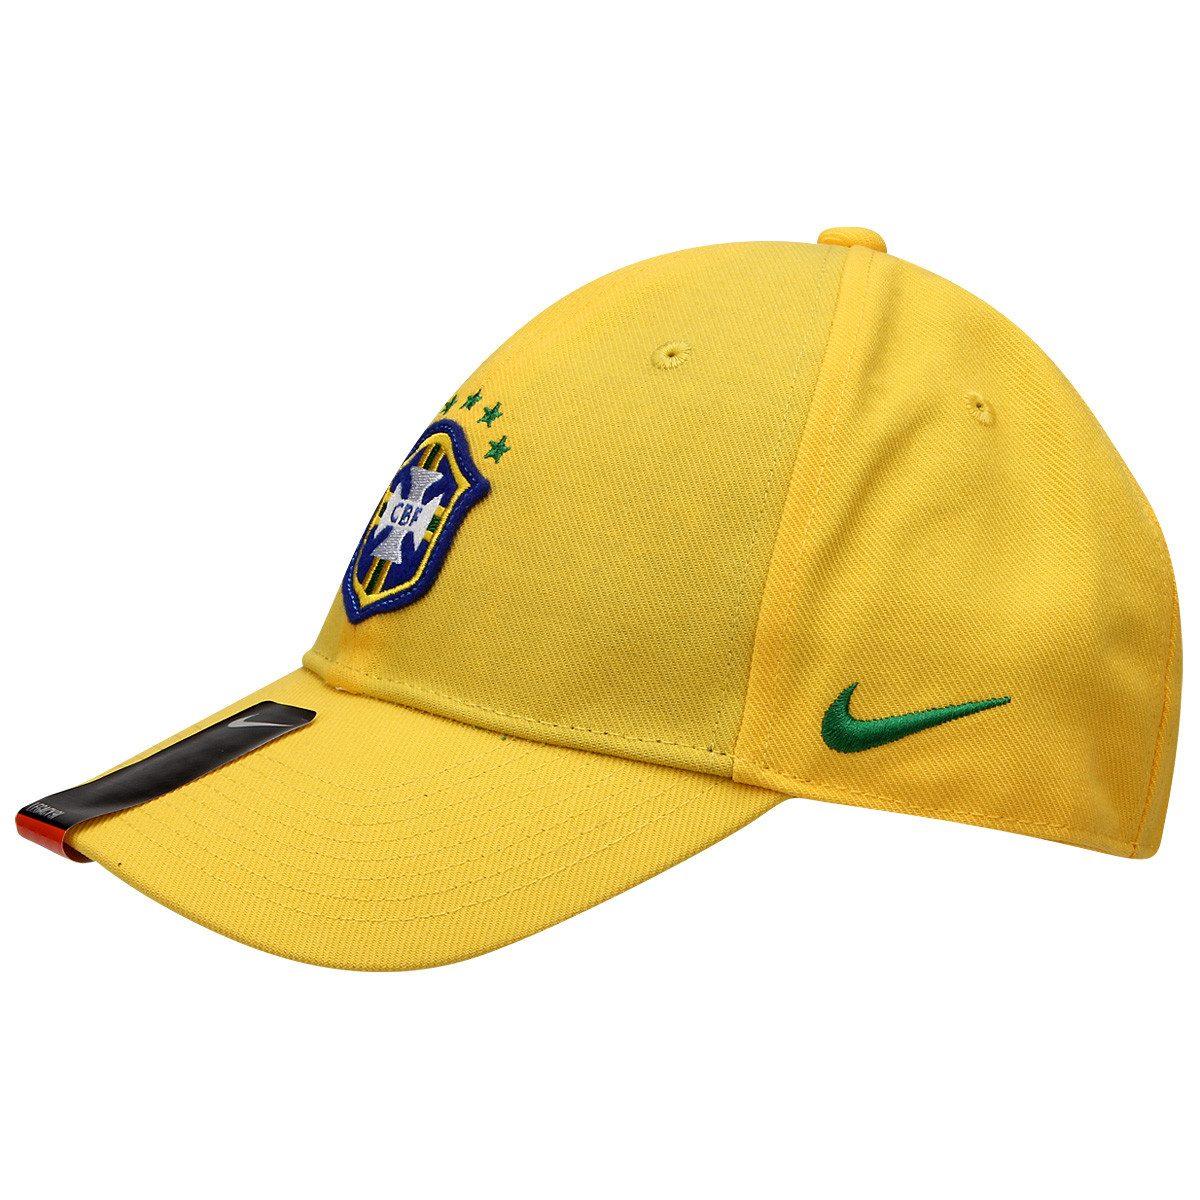 Boné Nike Brasil Cbf Tamanho P m Olimpiadas 16 De 249 P - R  128 3204364488d